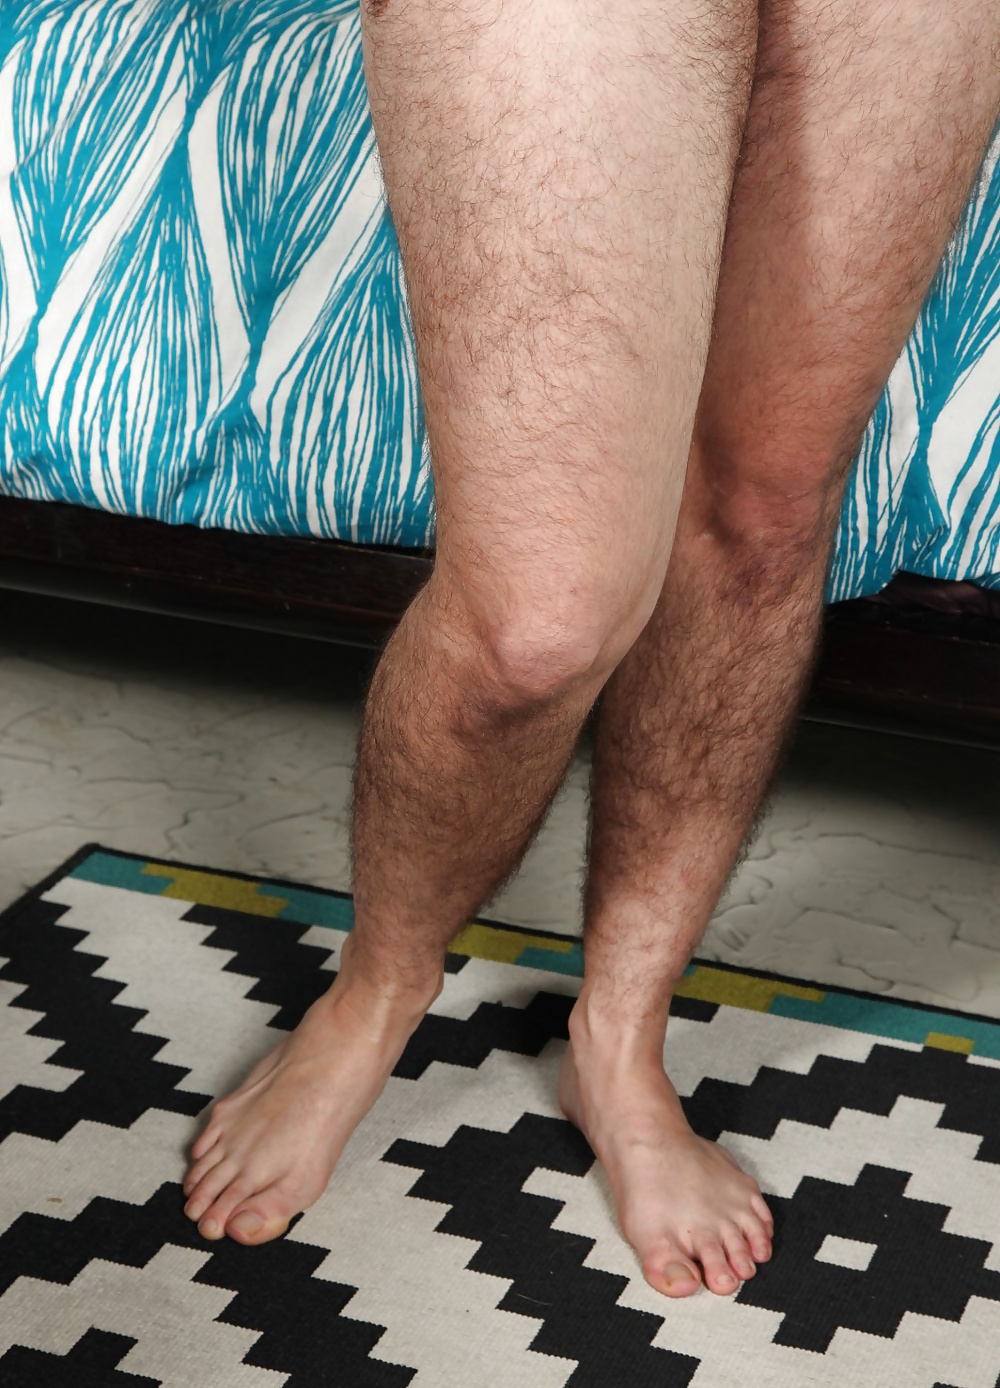 Hairy legs dvd